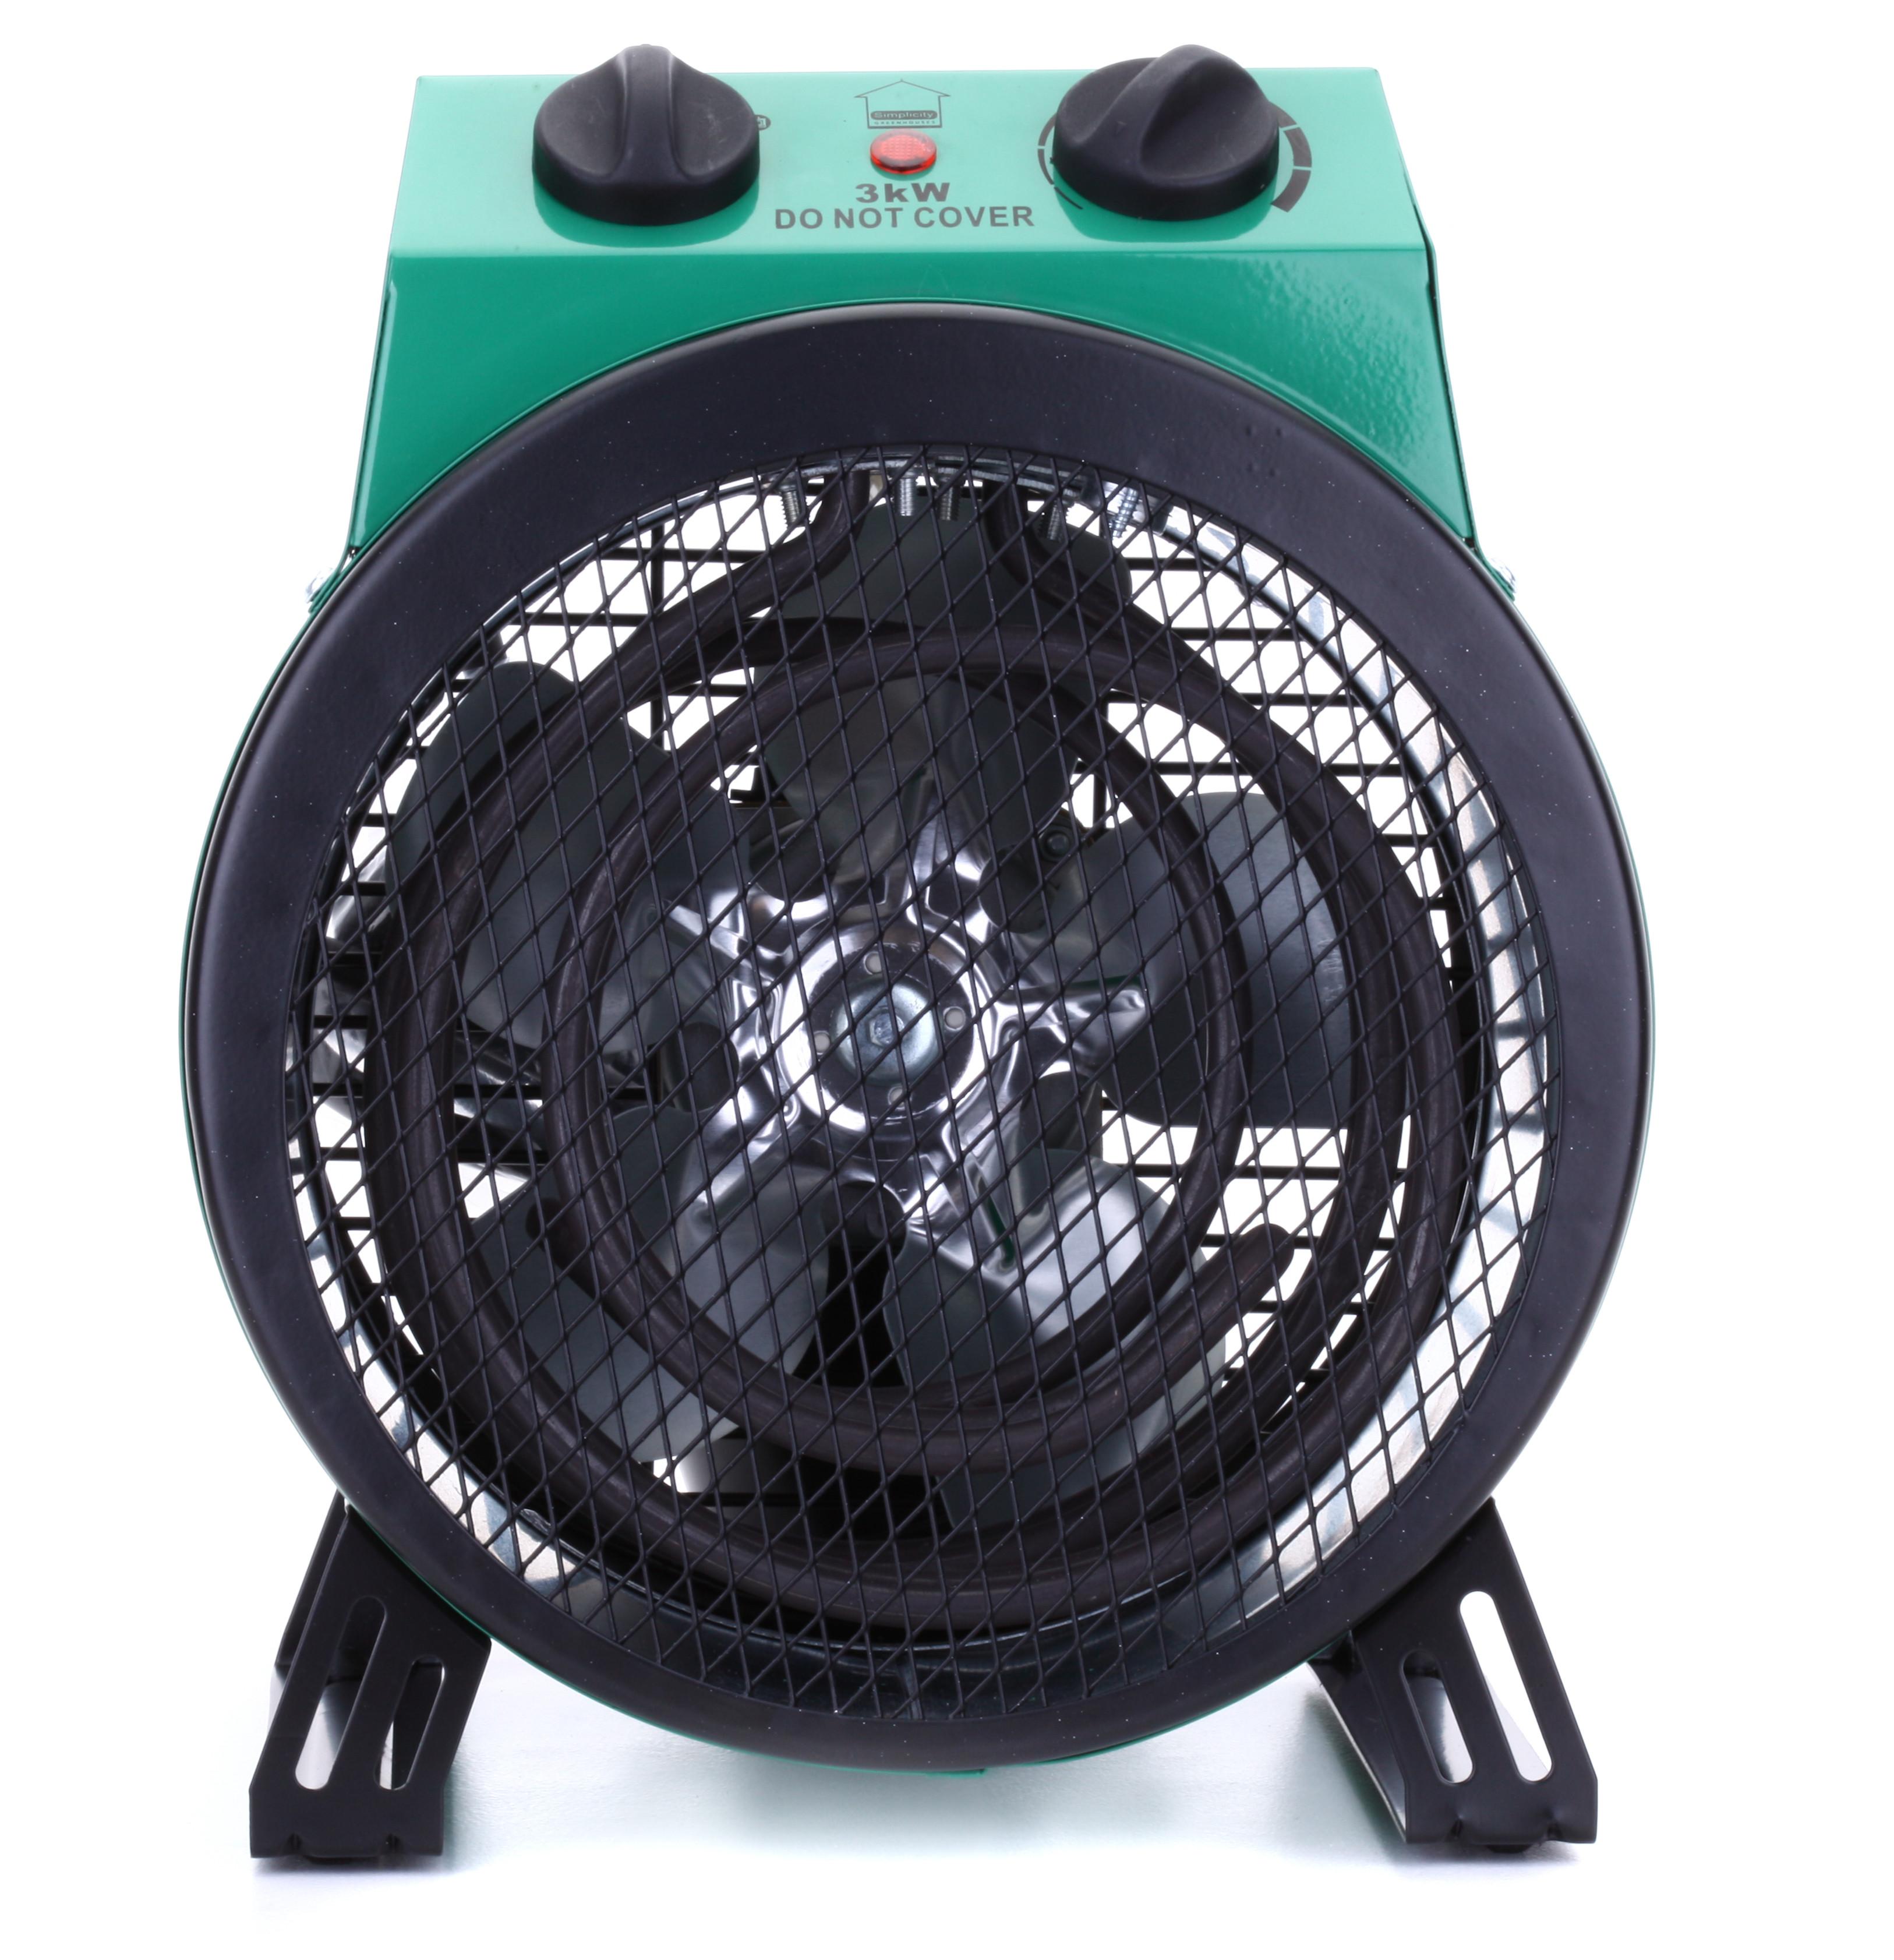 simplicity 3kw greenhouse fan heater. Black Bedroom Furniture Sets. Home Design Ideas